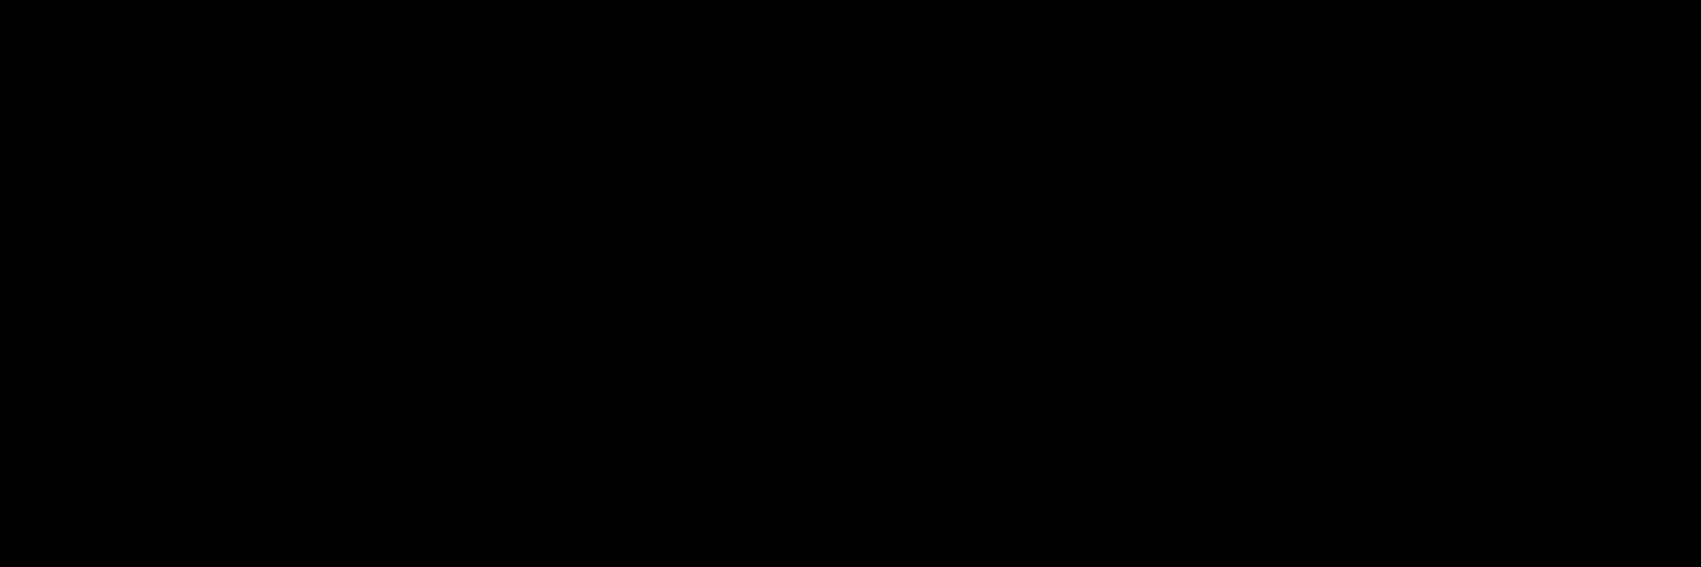 Webgalerie Zaansgroen